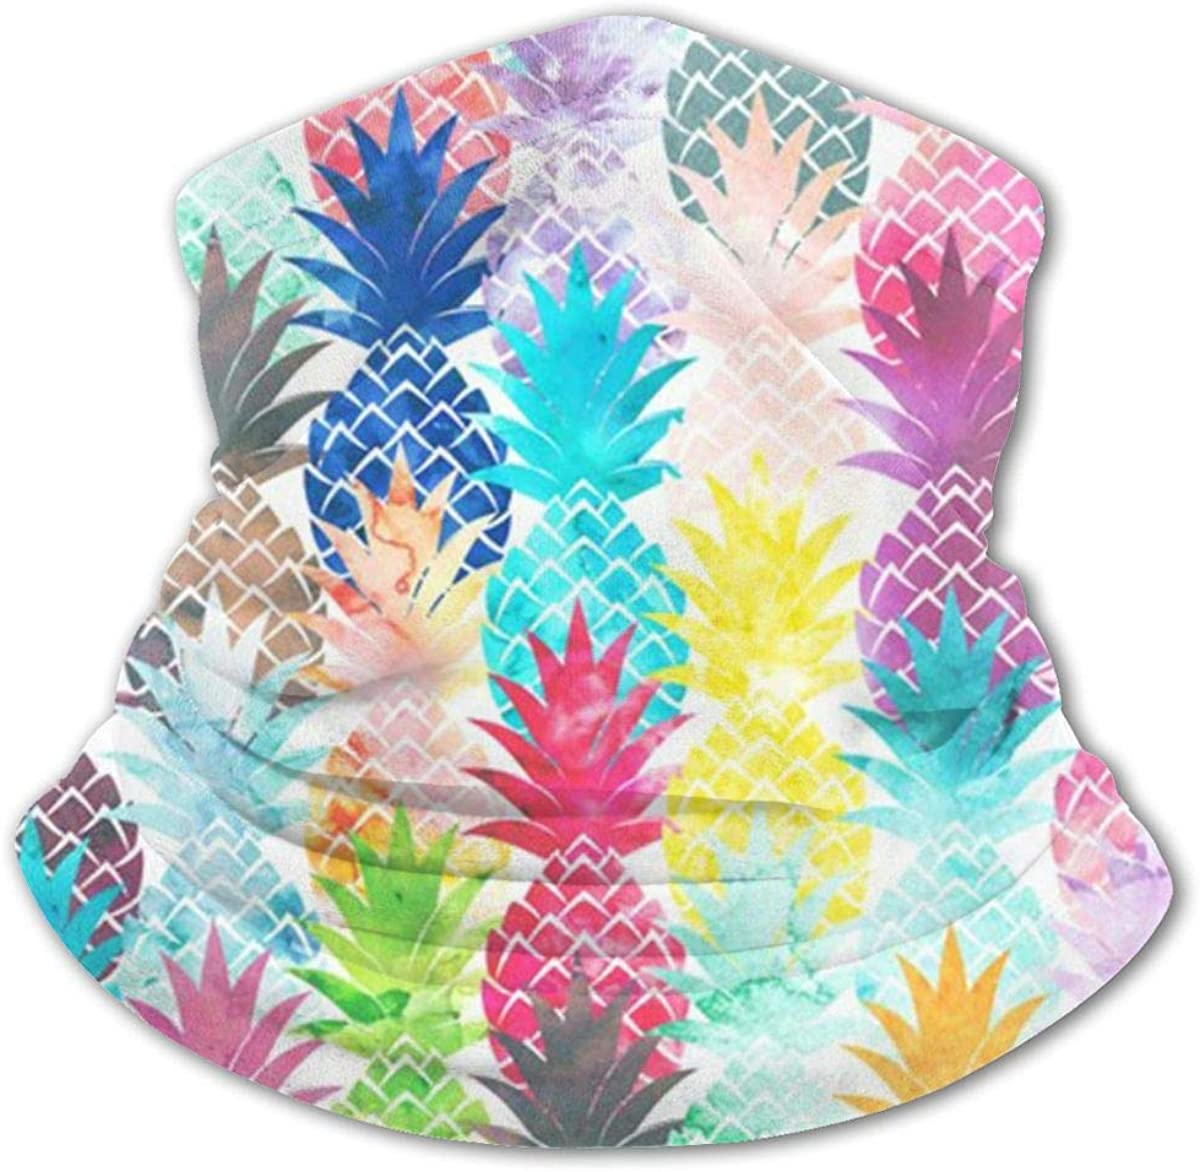 Hawaiian Tropical Pineapple Headwear For Girls And Boys, Head Wrap, Neck Gaiter, Headband, Tenn Fishing Mask, Magic Scarf, Tube Mask, Face Bandana Mask For Camping Running Cycling